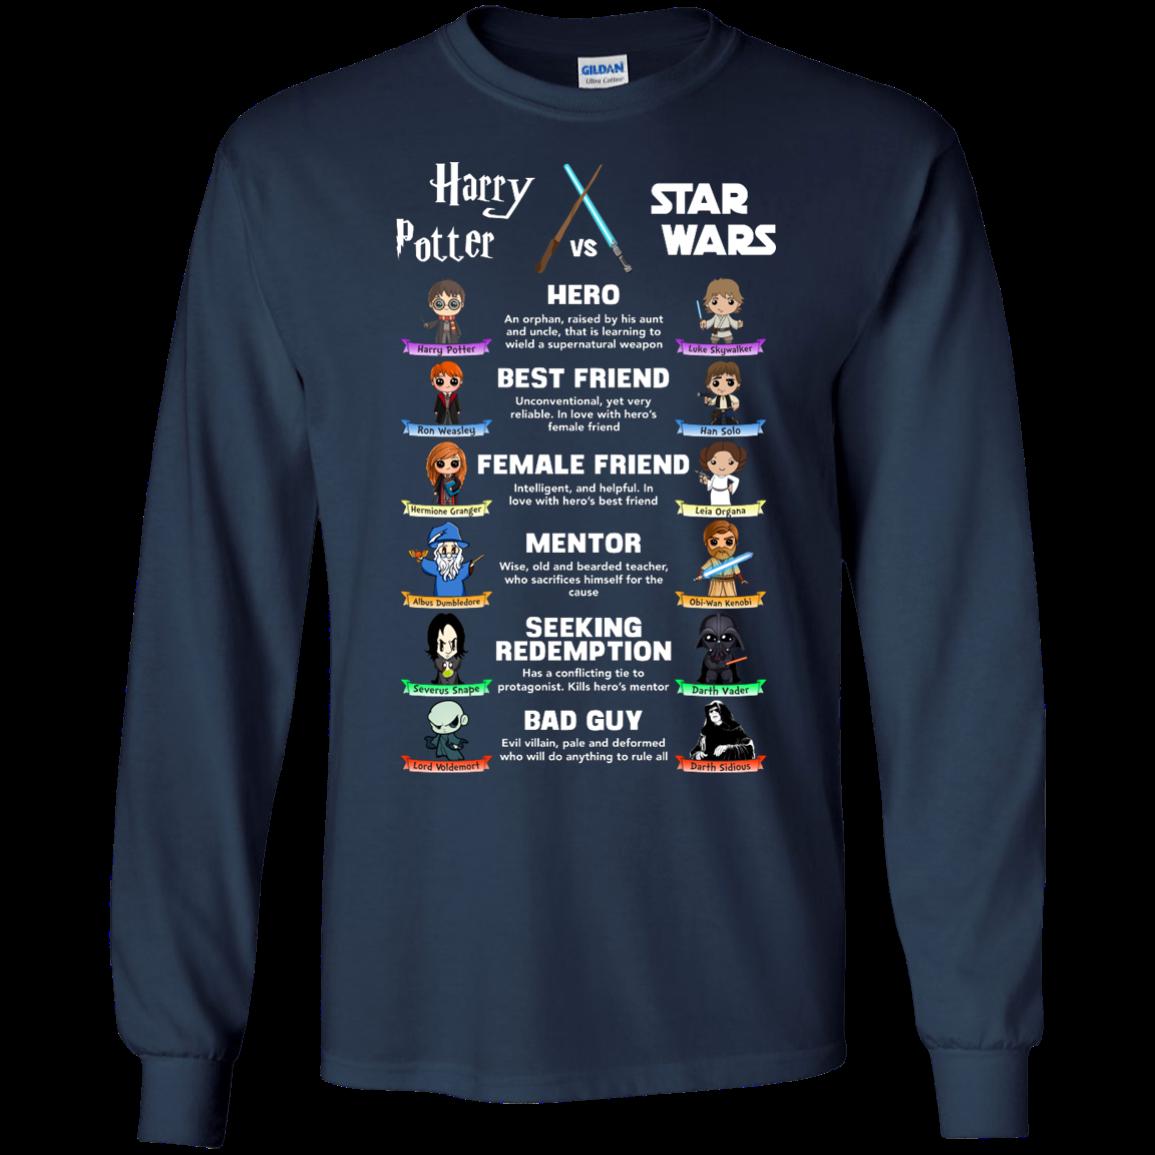 Harry Potter vs Star Wars unisex t shirt, tank, hoodie, long sleeve